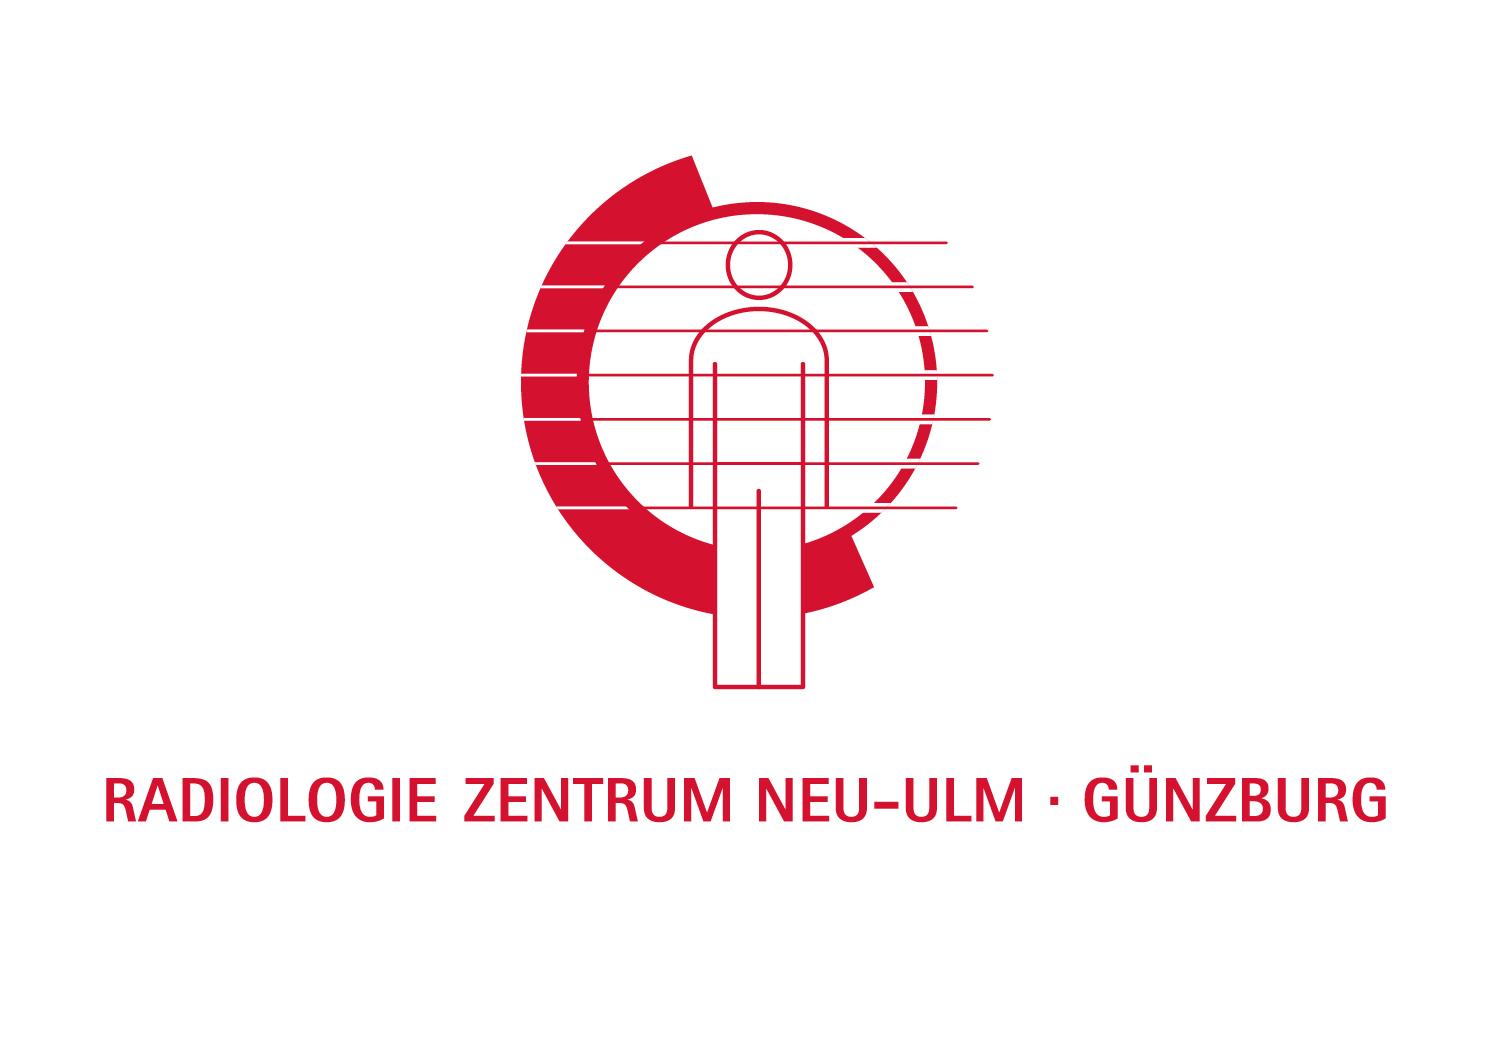 Radiologie Zentrum Neu-Ulm · Günzburg